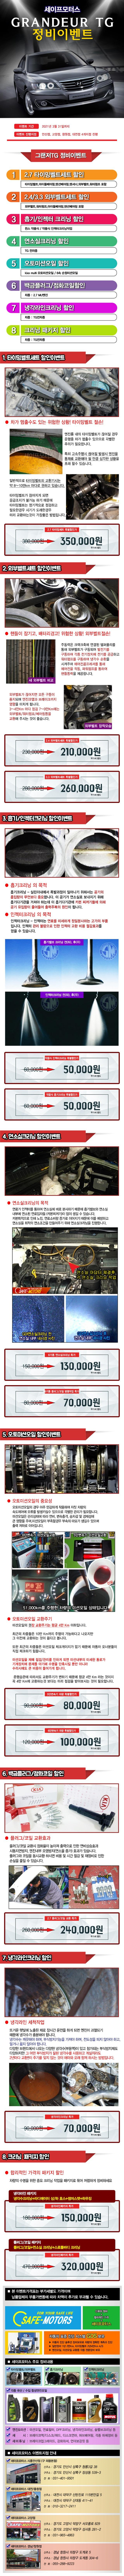 202102_TG_이벤트_고양_안산.jpg